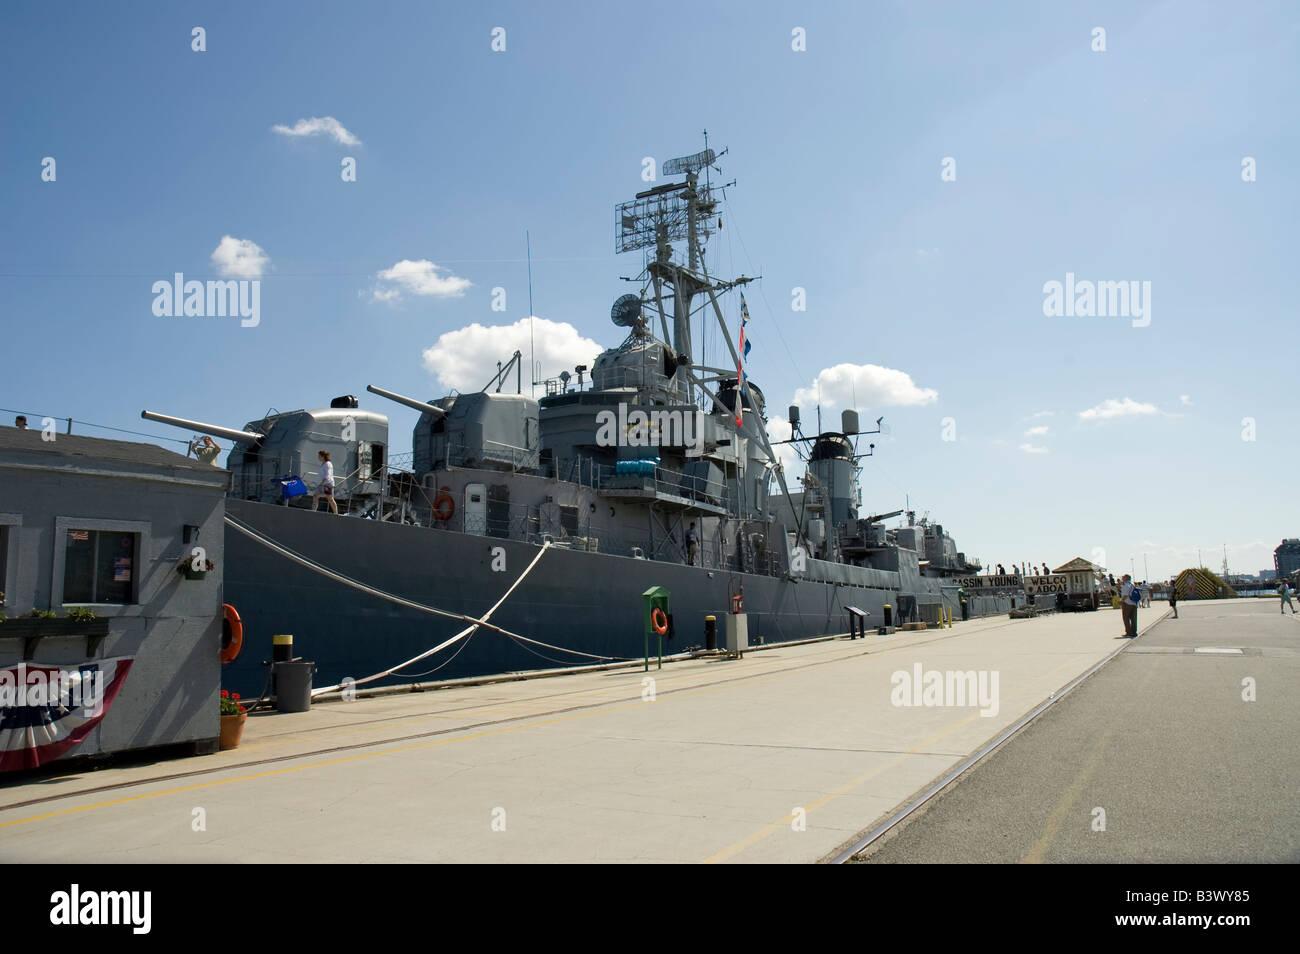 Navy ship USS Cassin Young,Boston, Mass, USA - Stock Image